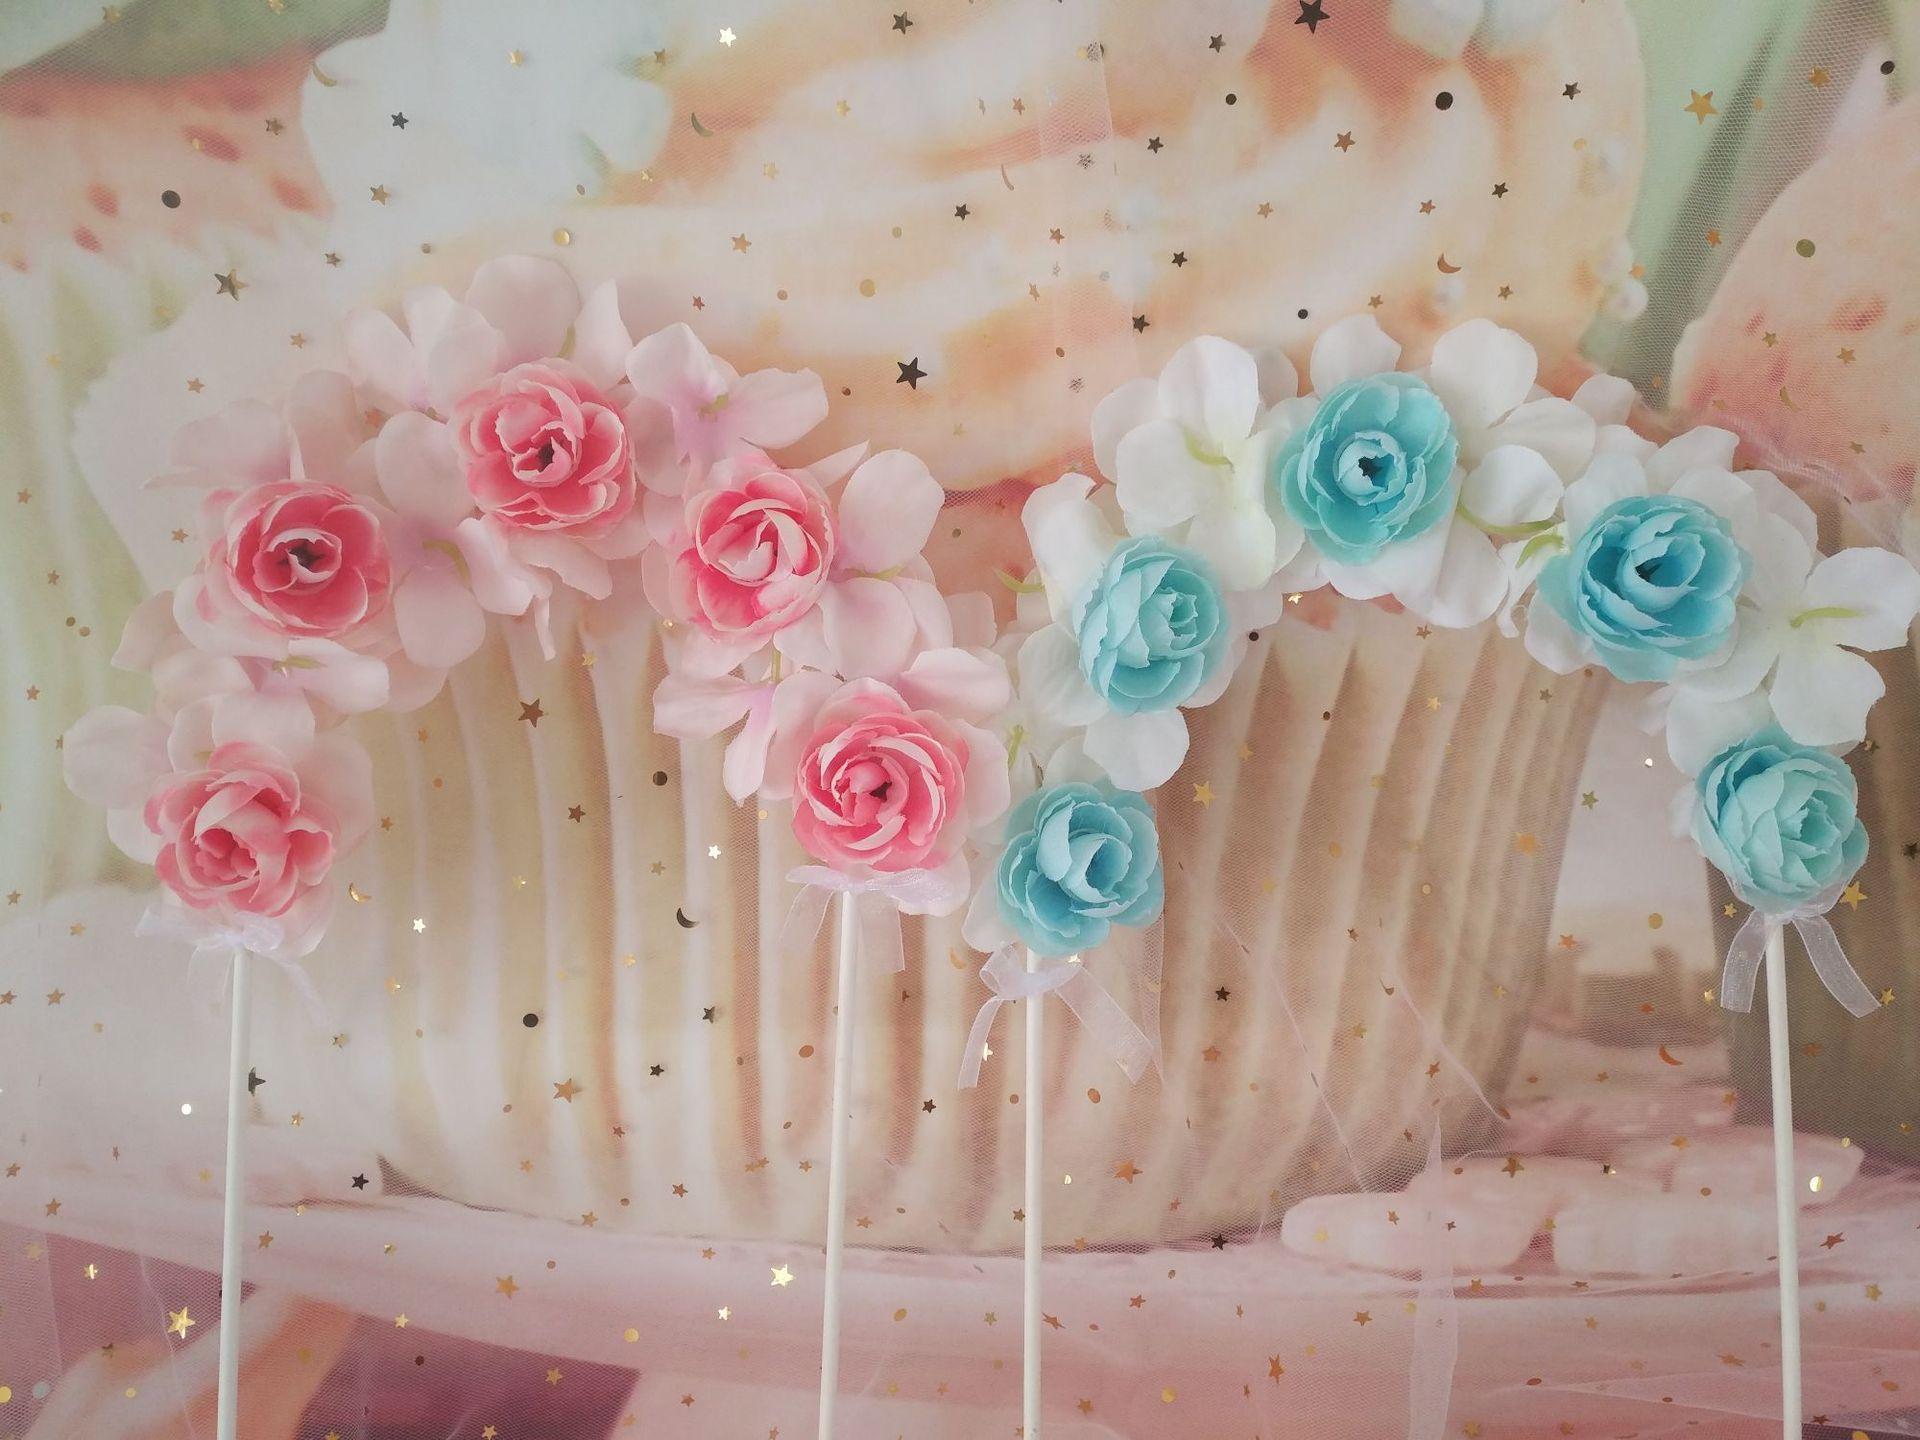 Grosshandel 10 Stucke Cake Topper Kuchen Dekorieren Liefert Rose